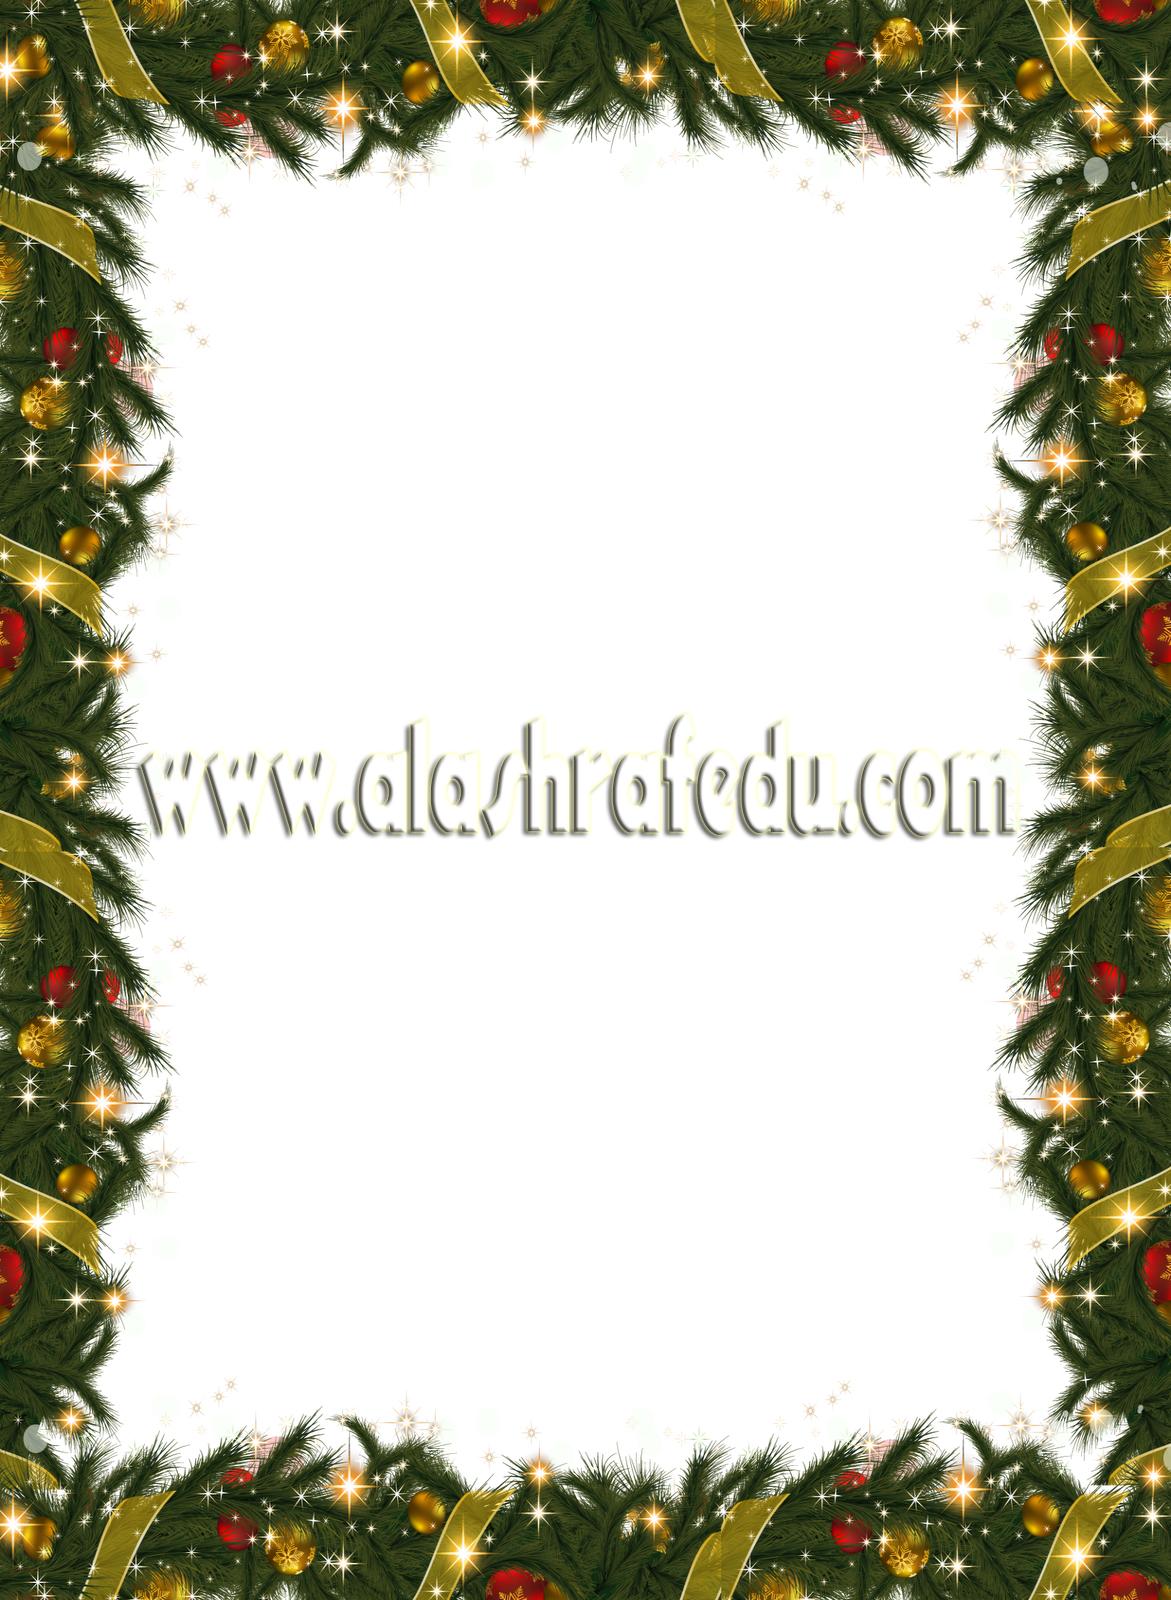 Christmas Holiday Frame With Garland 2018 www.alashrafedu.com1